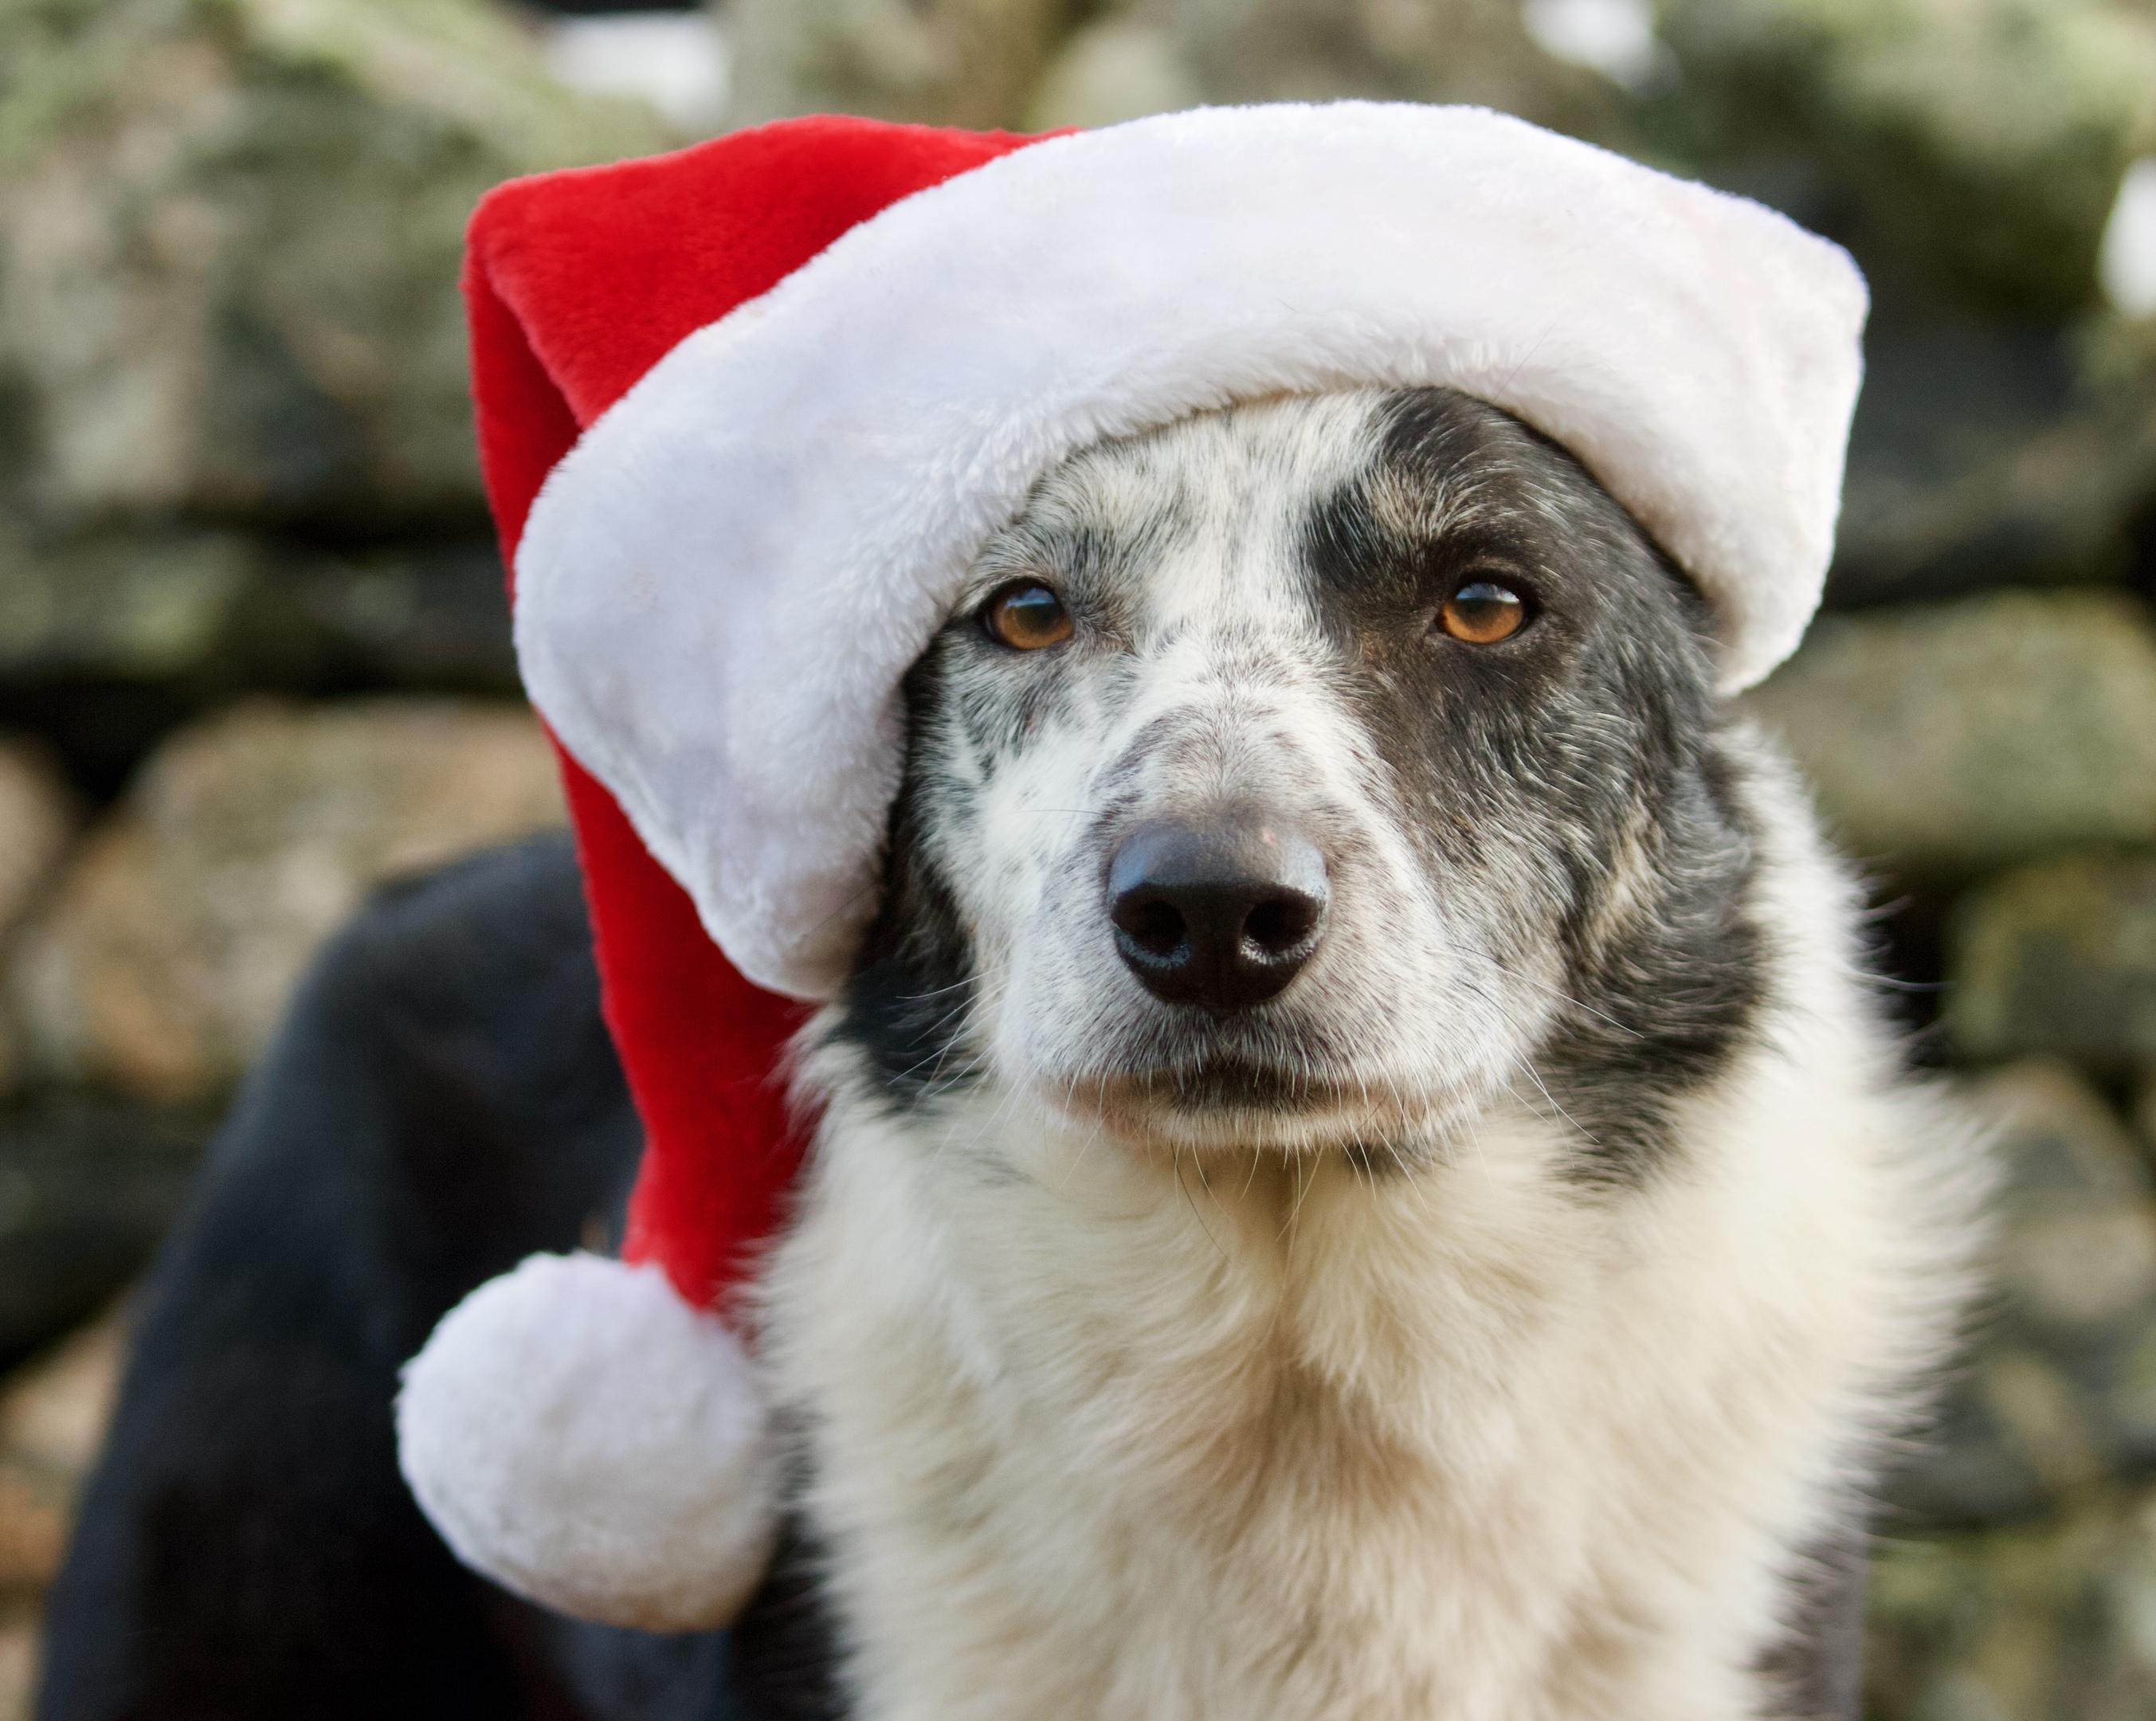 Jock, one of the Armadale farm sheepdogs, has embraced the seasonal spirit